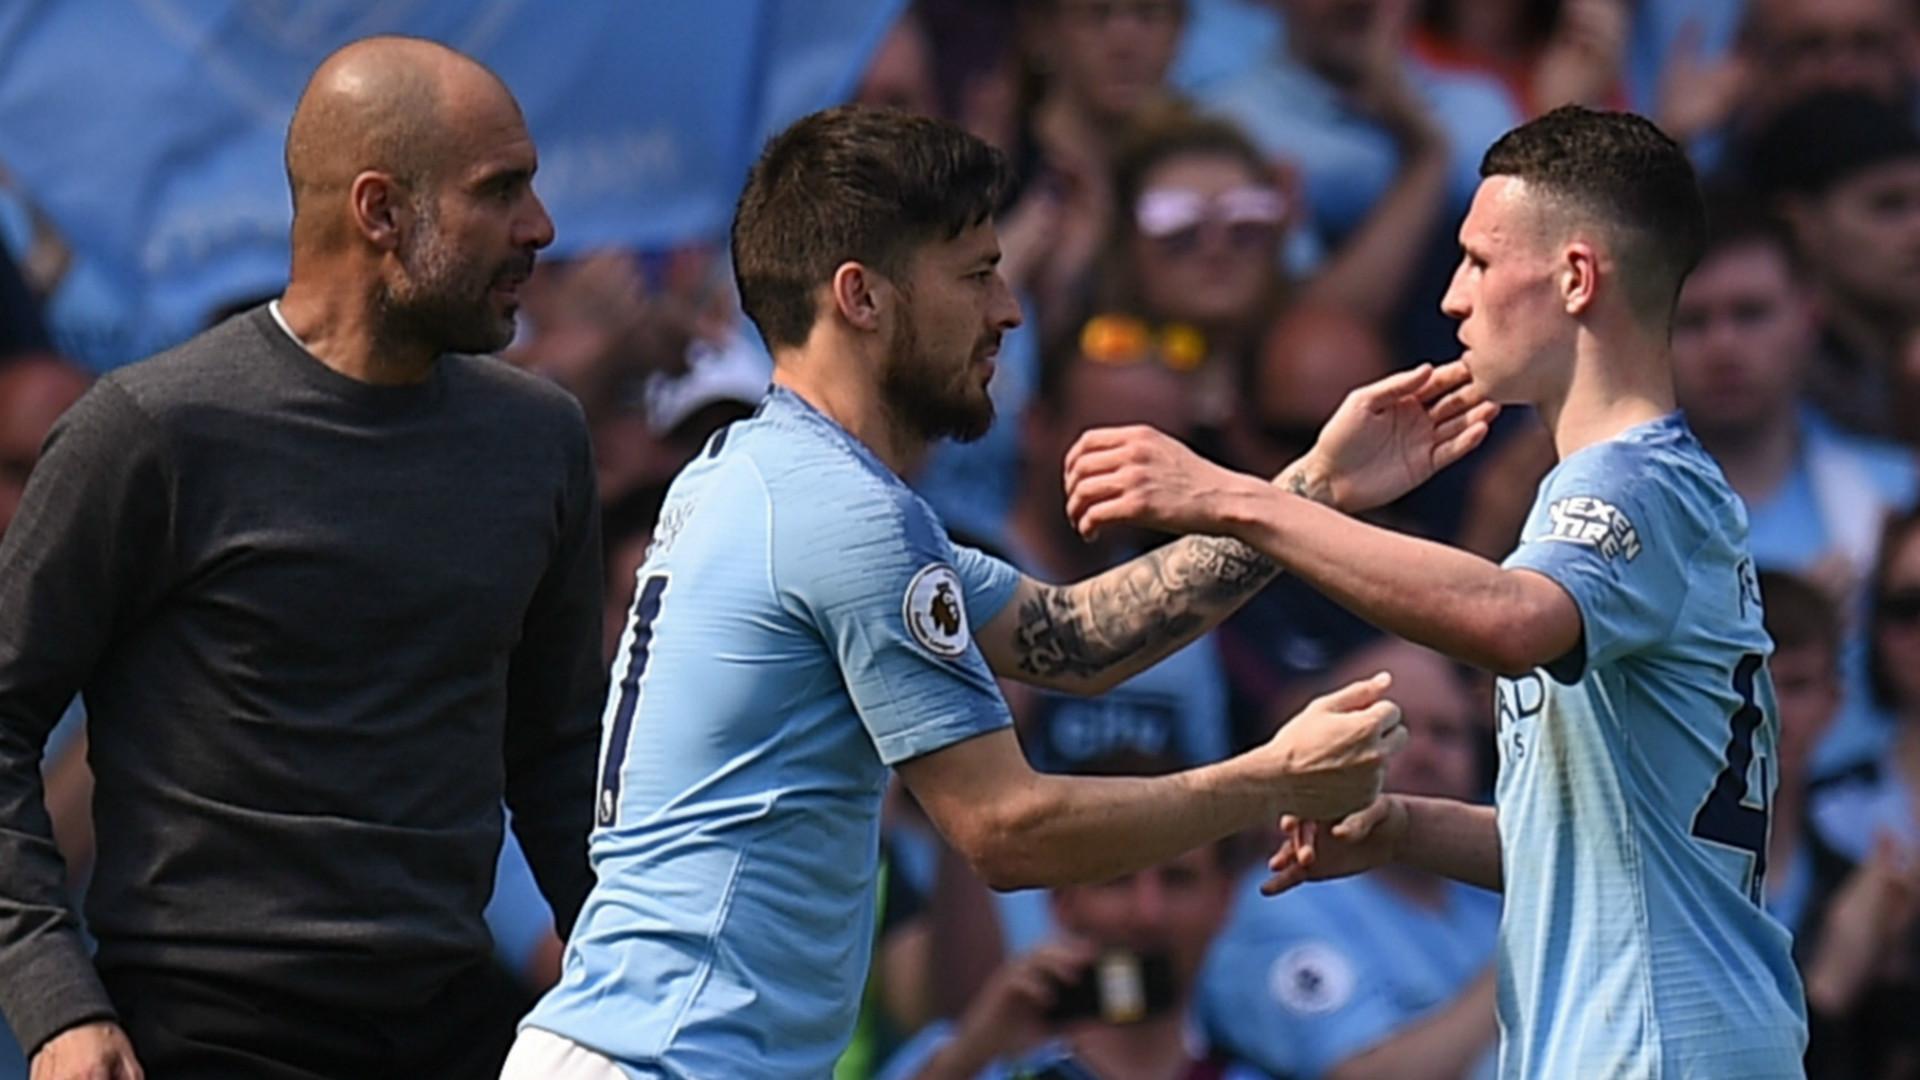 Next season at Man City will be last one - Silva